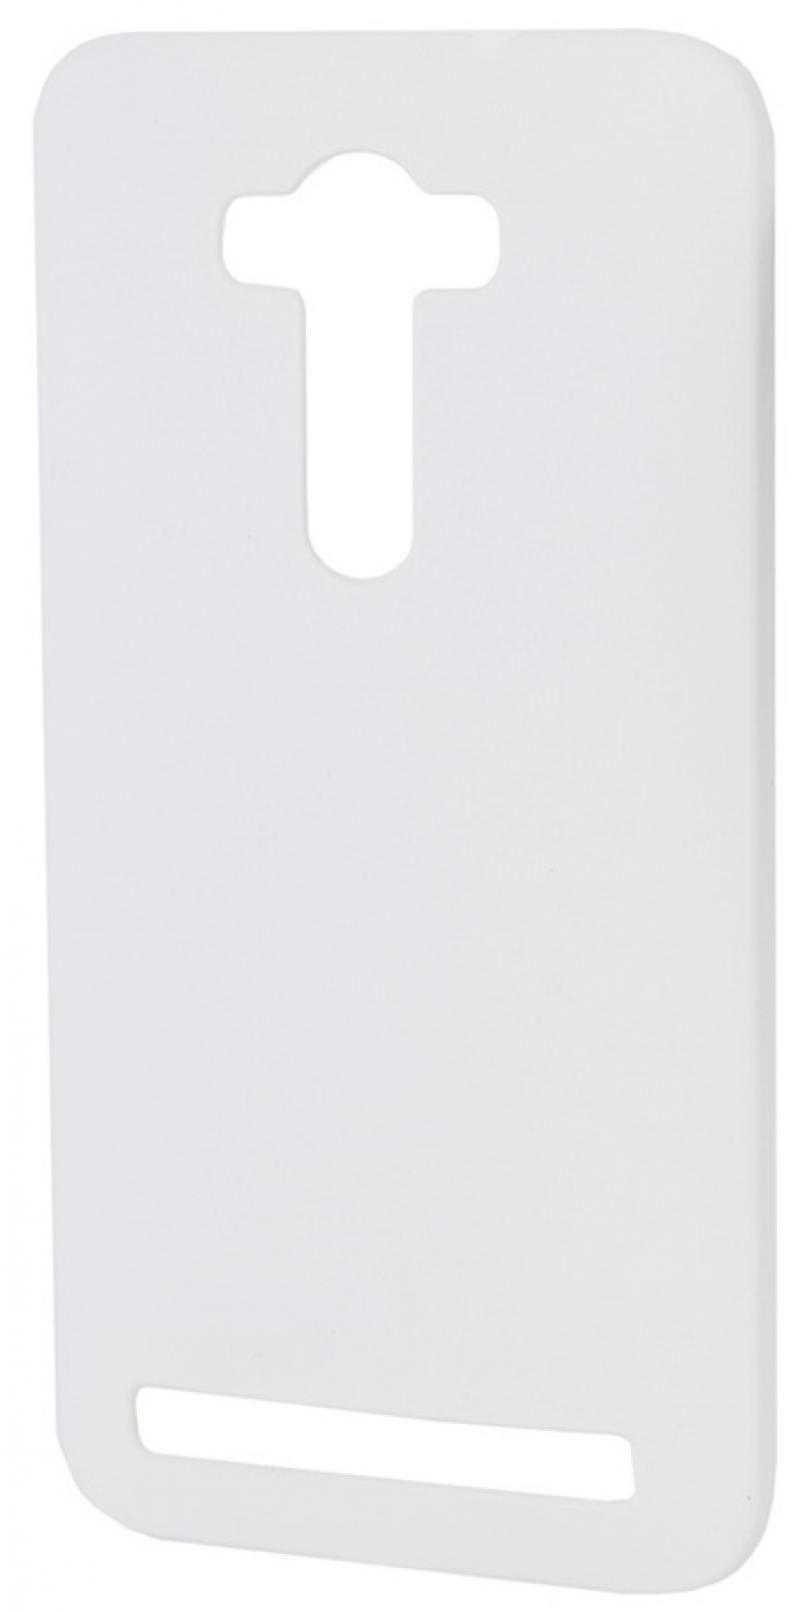 Чехол-накладка для Asus Zenfone С ZC451CG Pulsar CLIPCASE PC White клип-кейс, пластик все цены